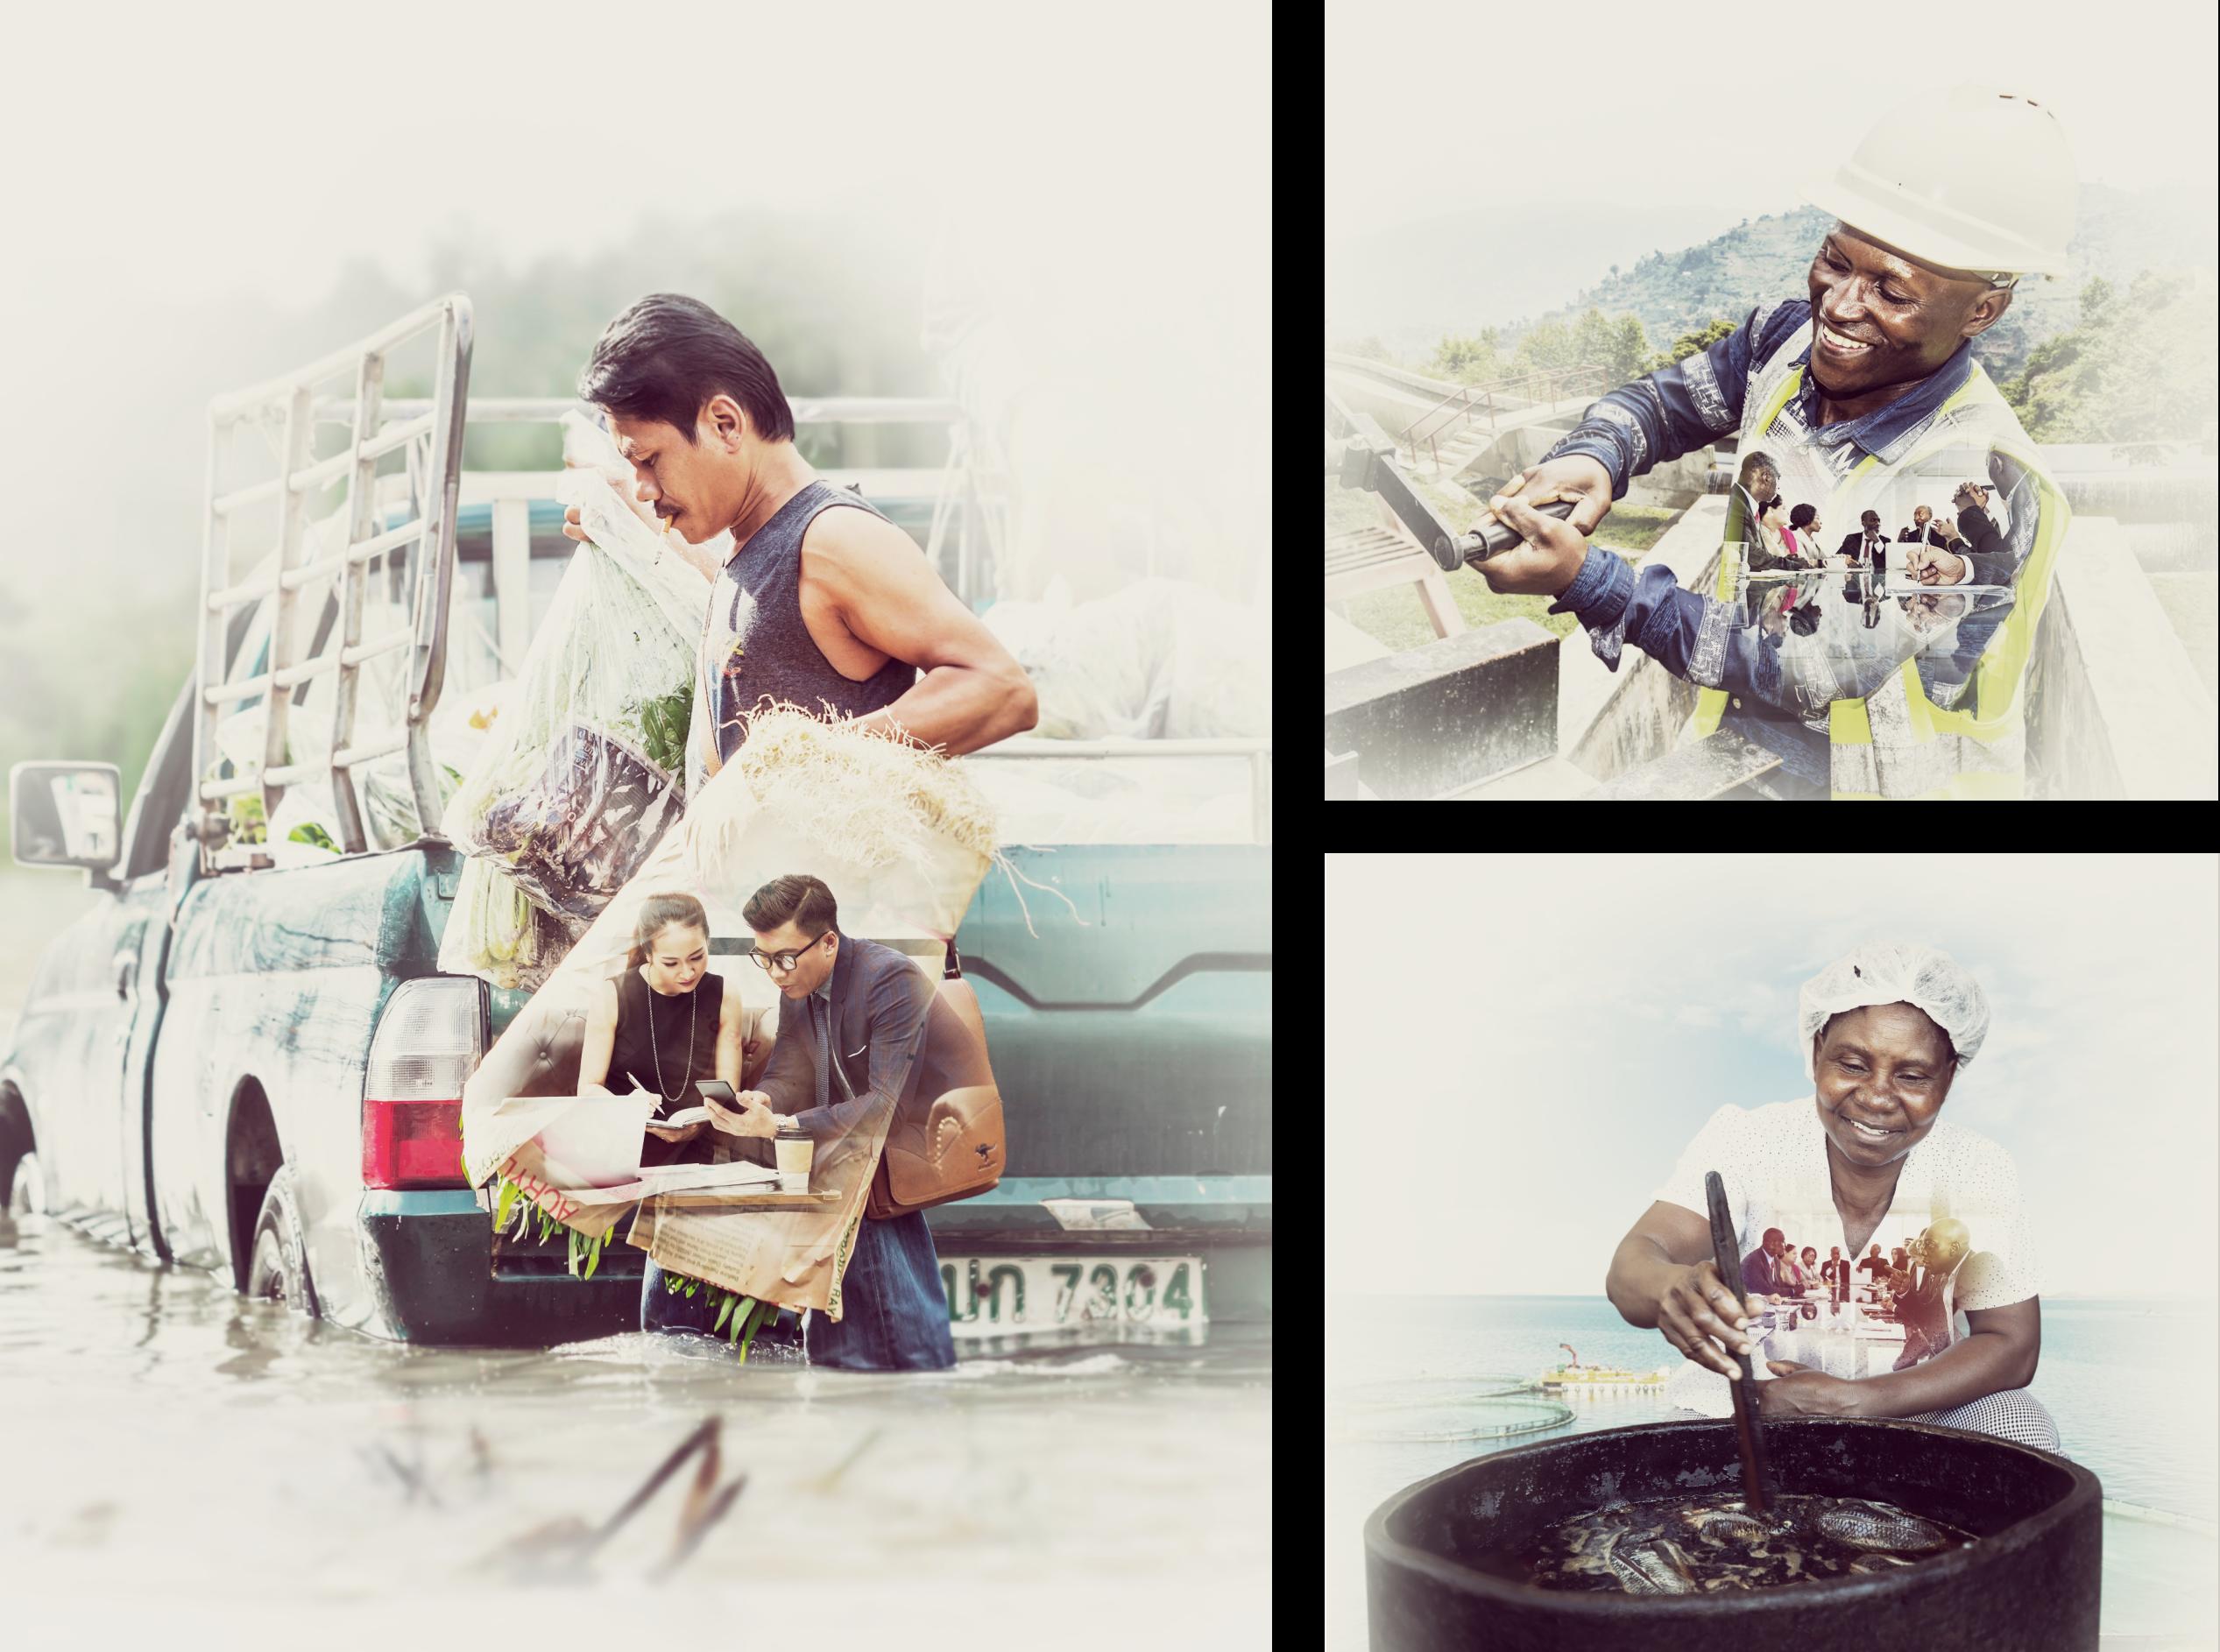 FMO collage image